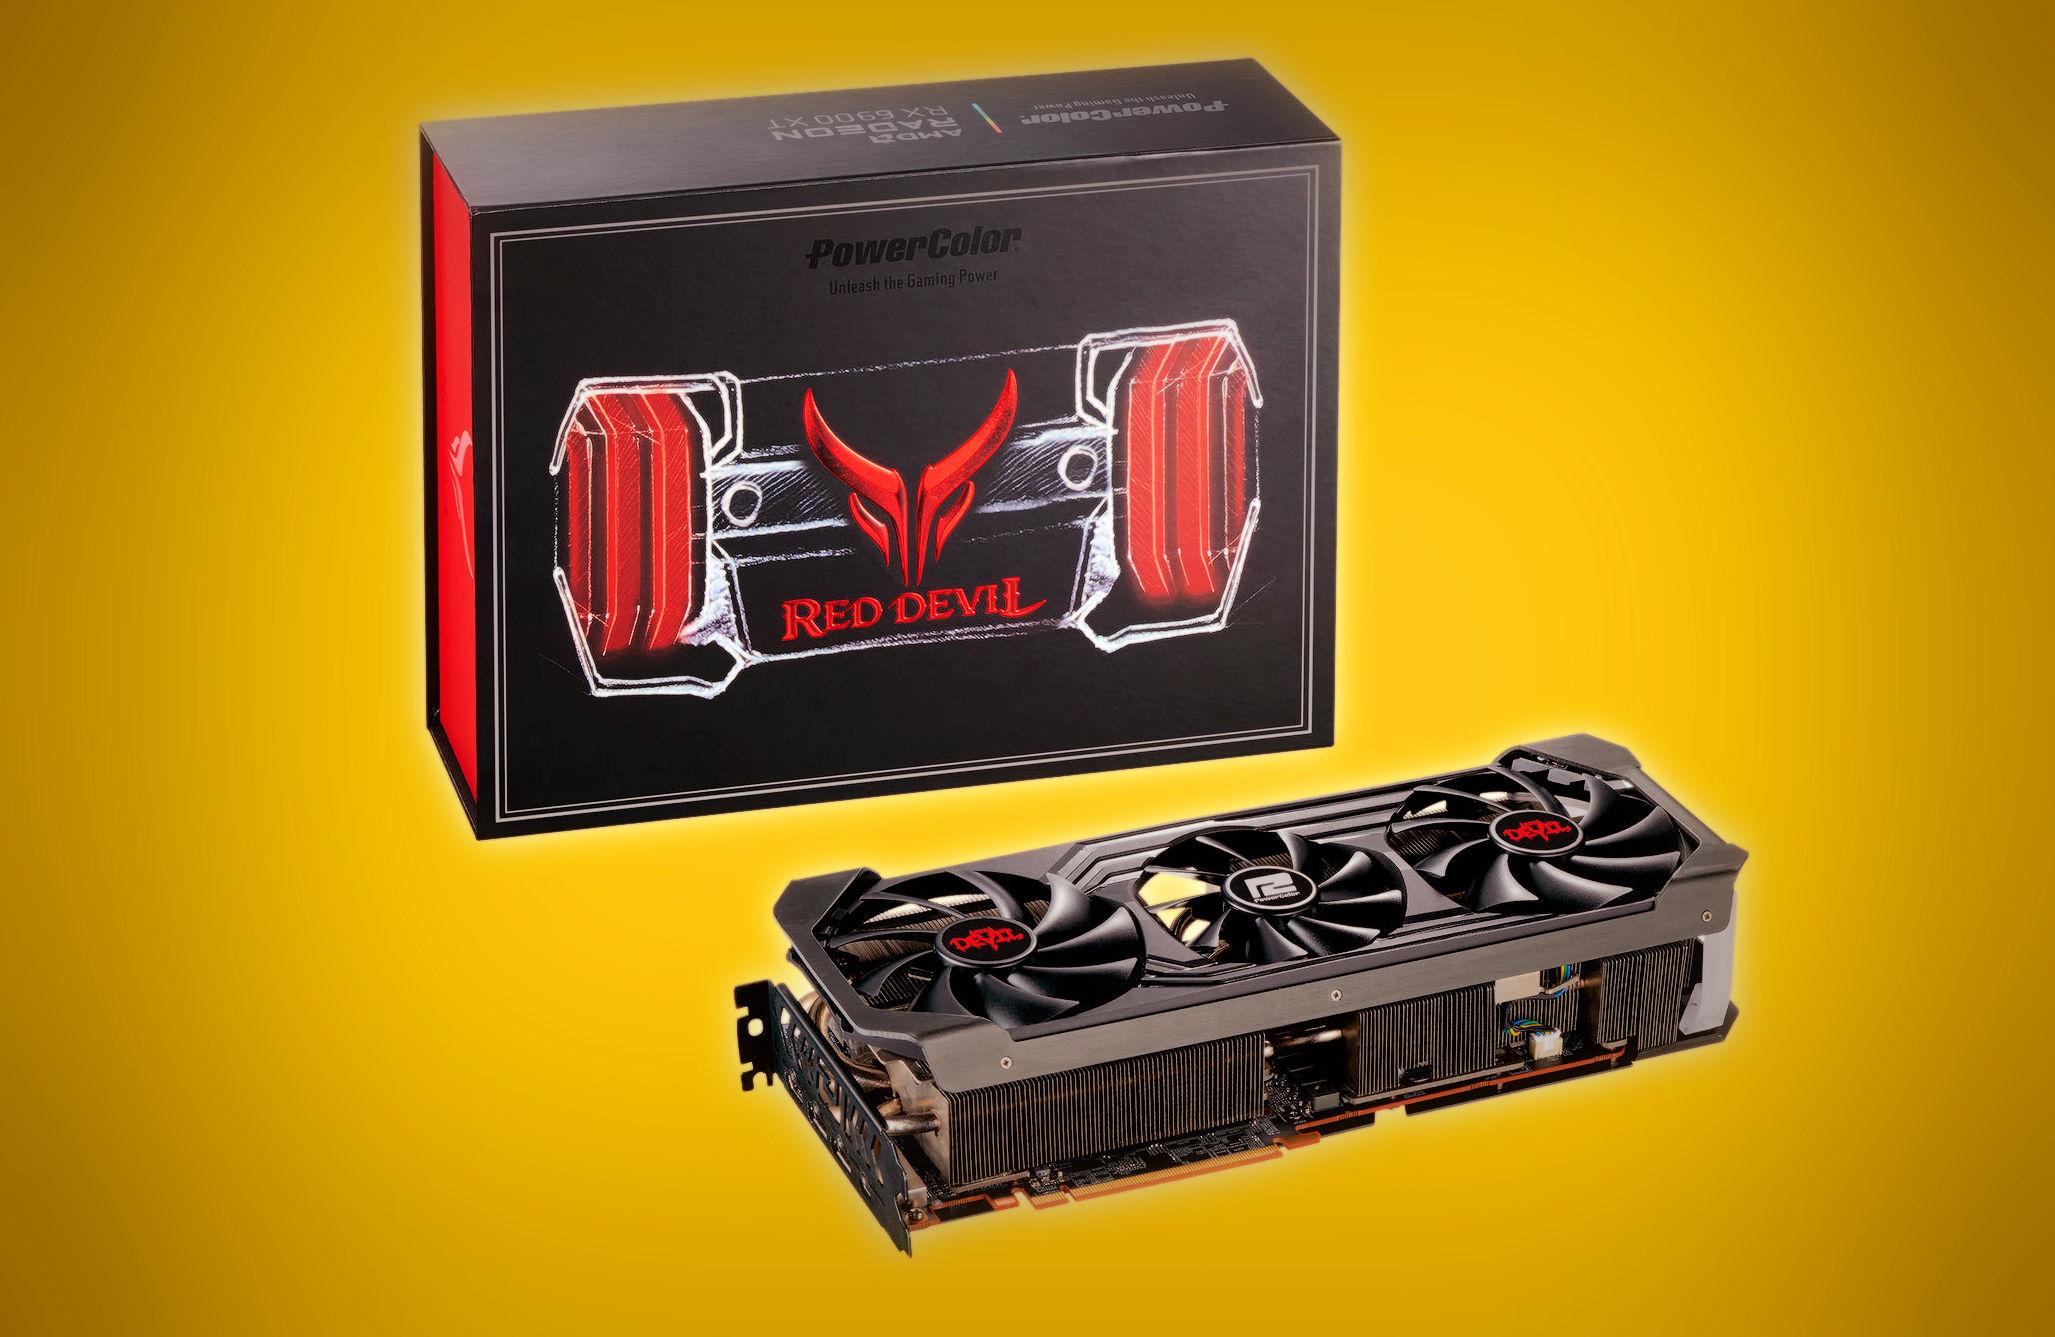 PowerColor Radeon RX 6900 XT Red Devil Limited Edition pictured – VideoCardz.com